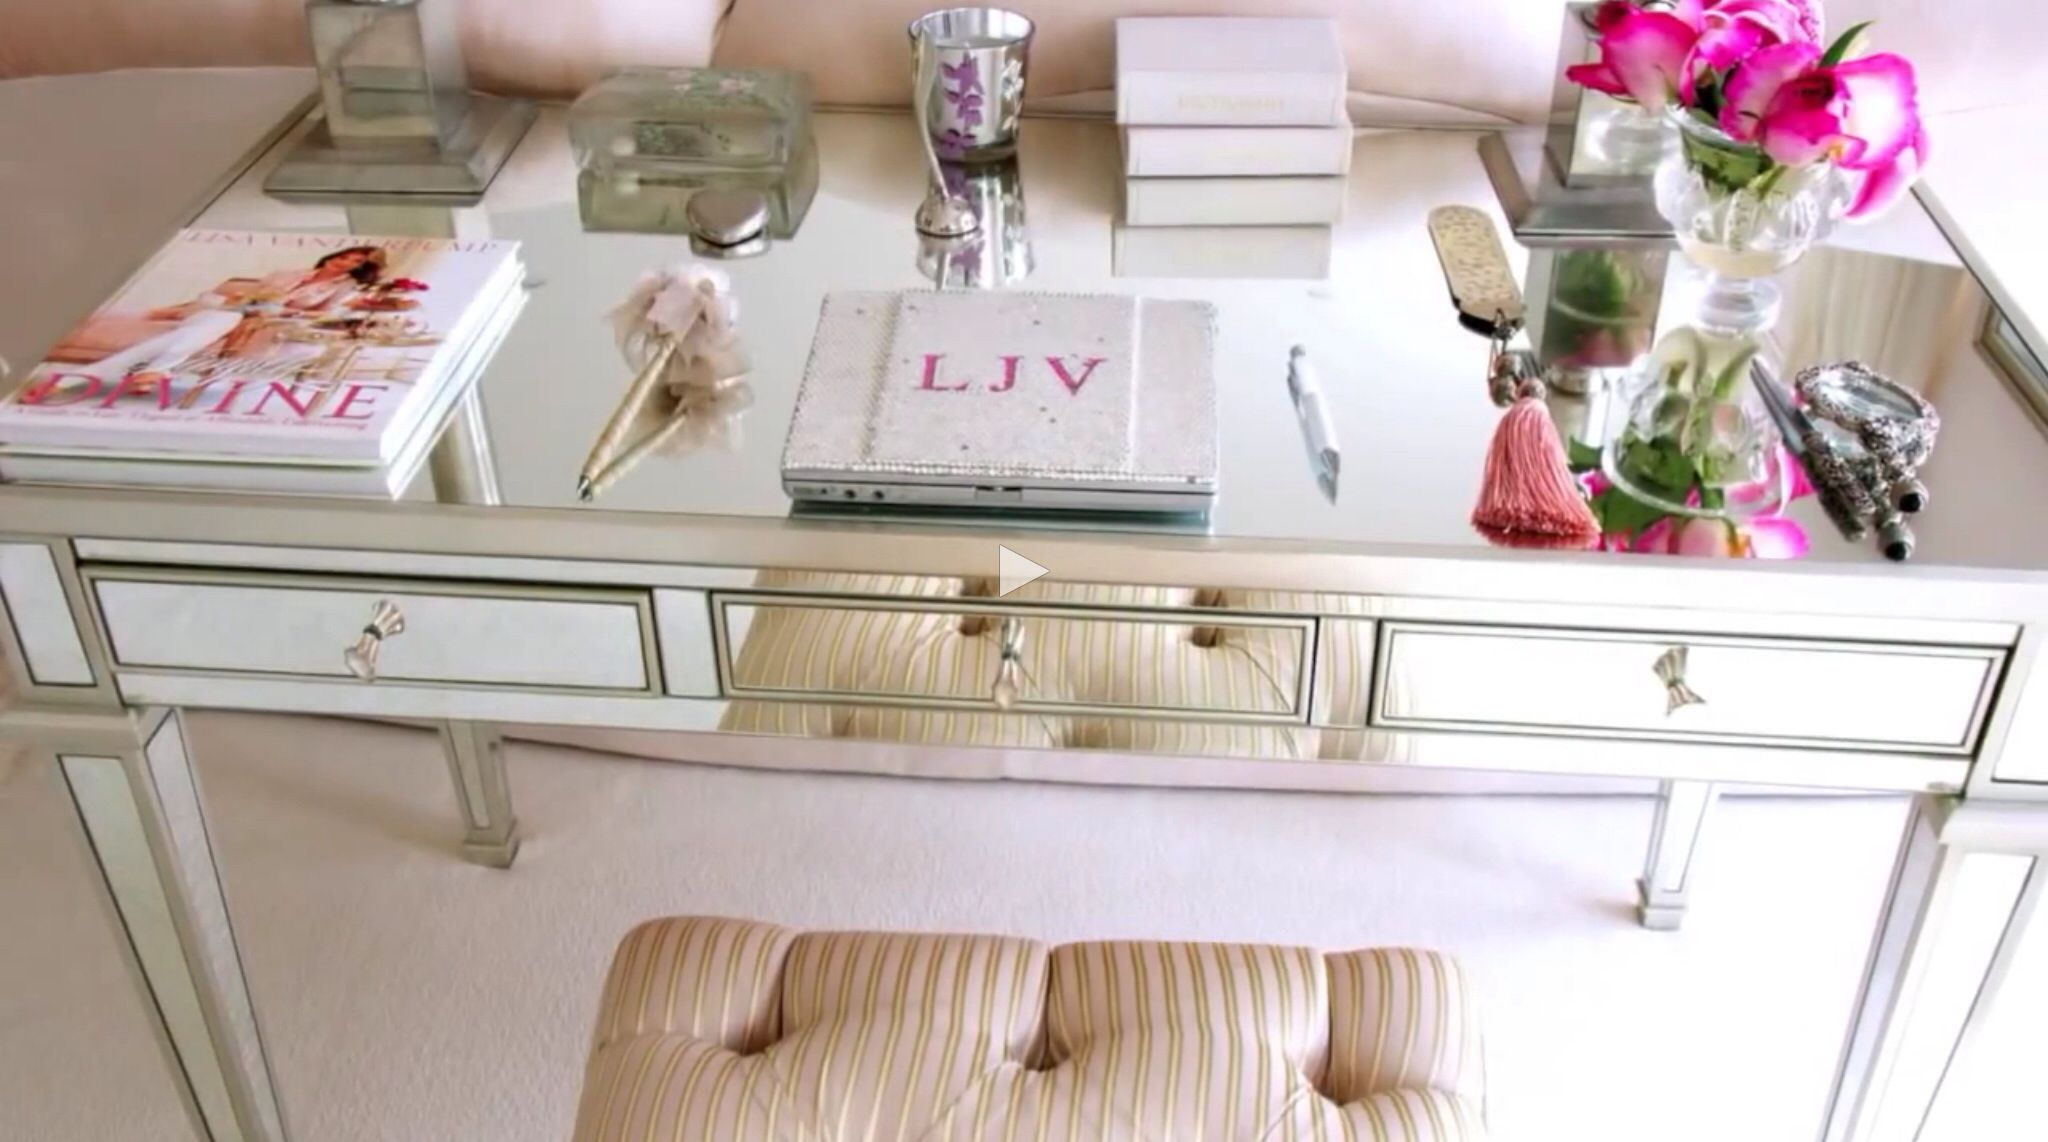 Villa Rosa Master Bedroom Sitting Area Desk Lisa Vanderpump Home